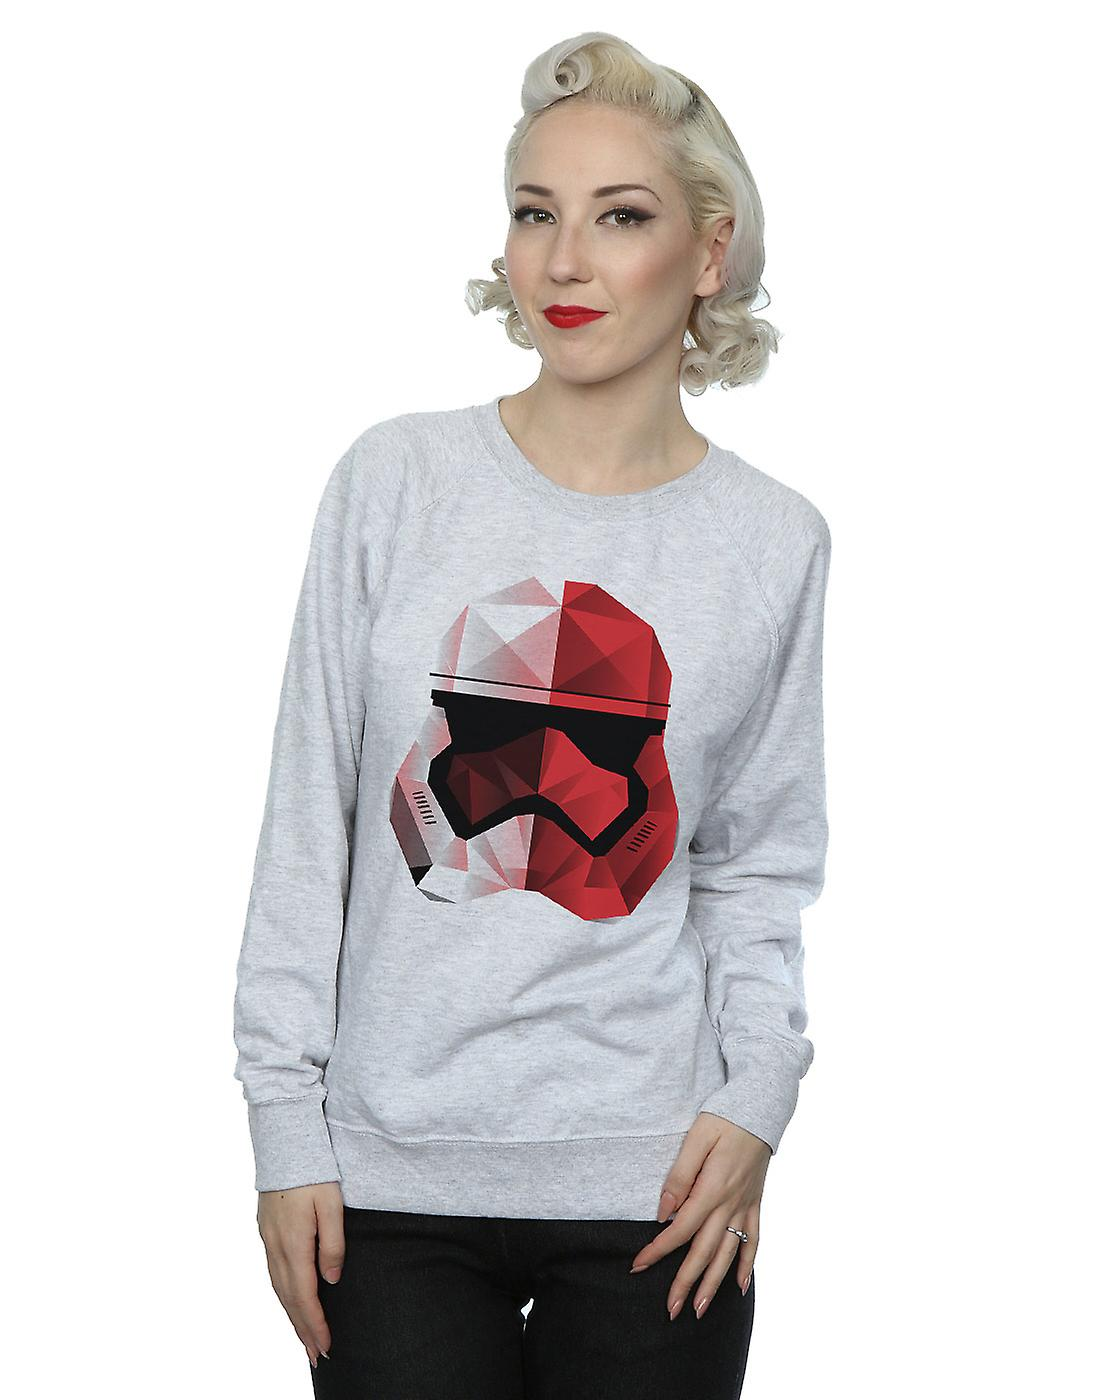 Star le dernier Jedi Stormtrooper cubiste rouge casque Sweatshirt Wars féminin